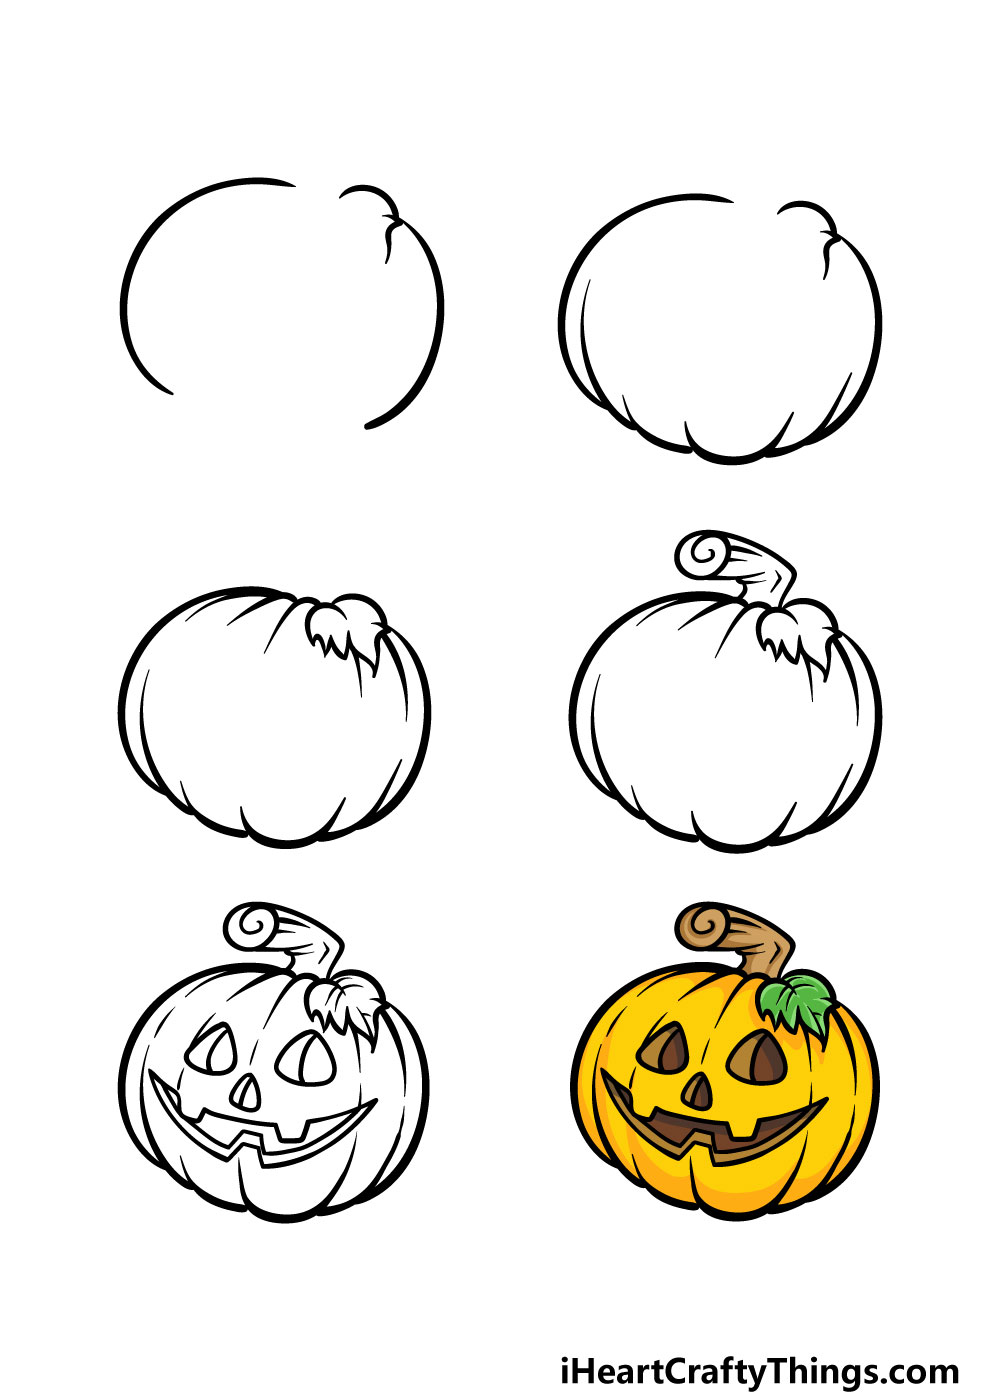 how to draw jack-o-lantern in 6 steps